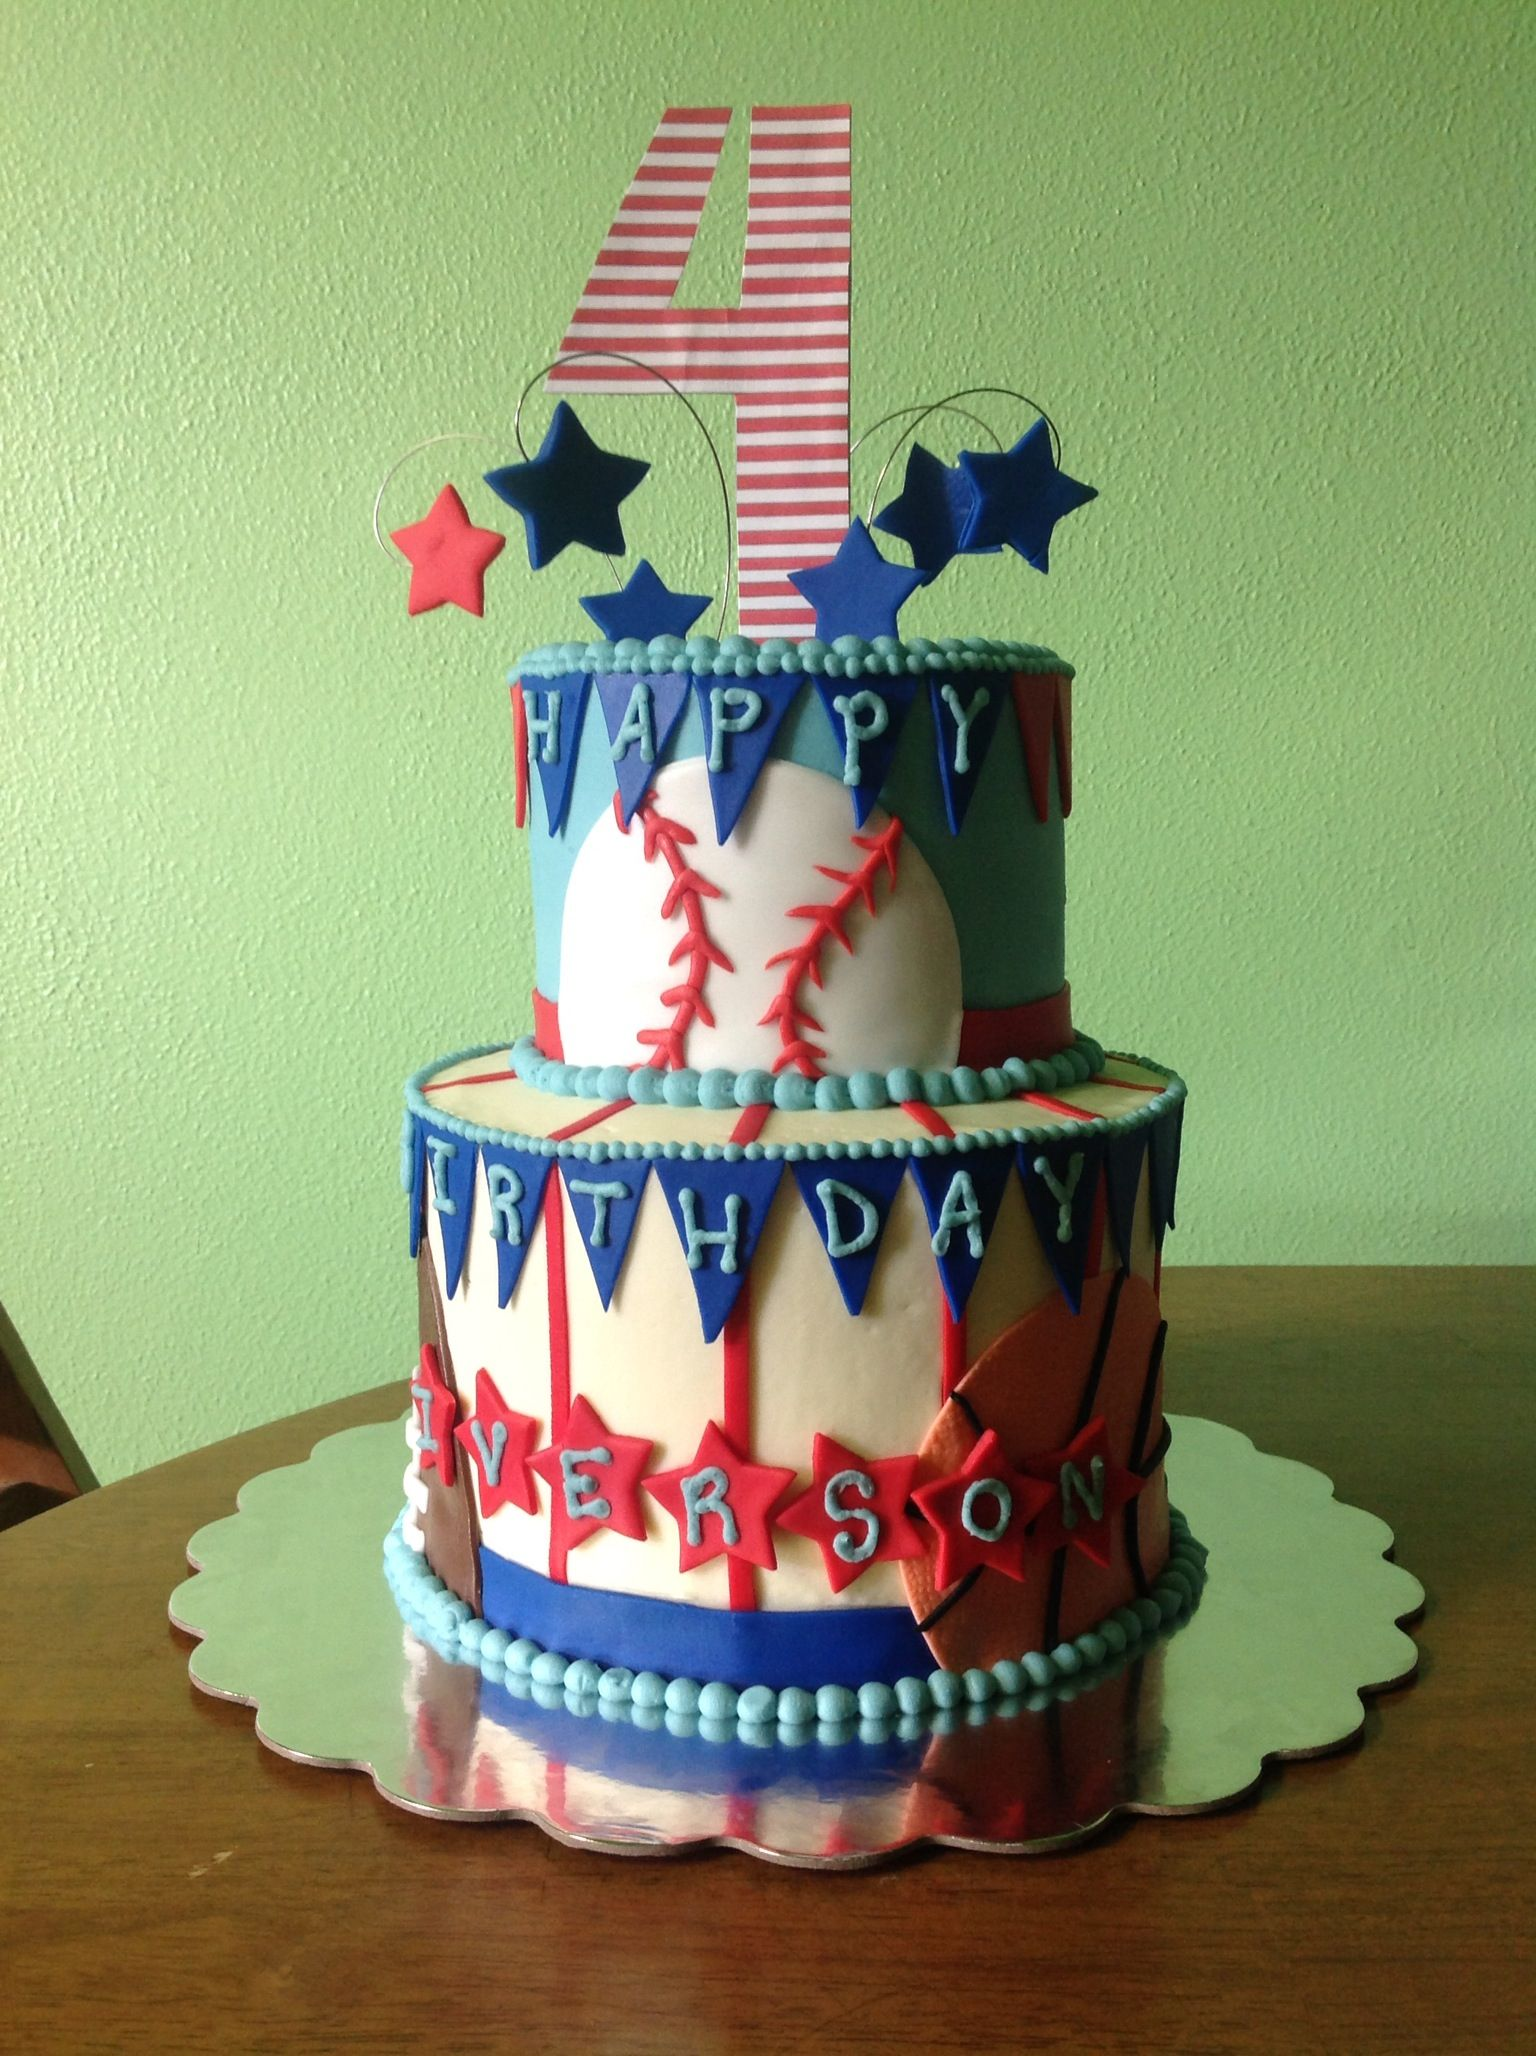 Sports Birthday Cake By Nikki Doan Cakes By Nikki Doan Pinterest